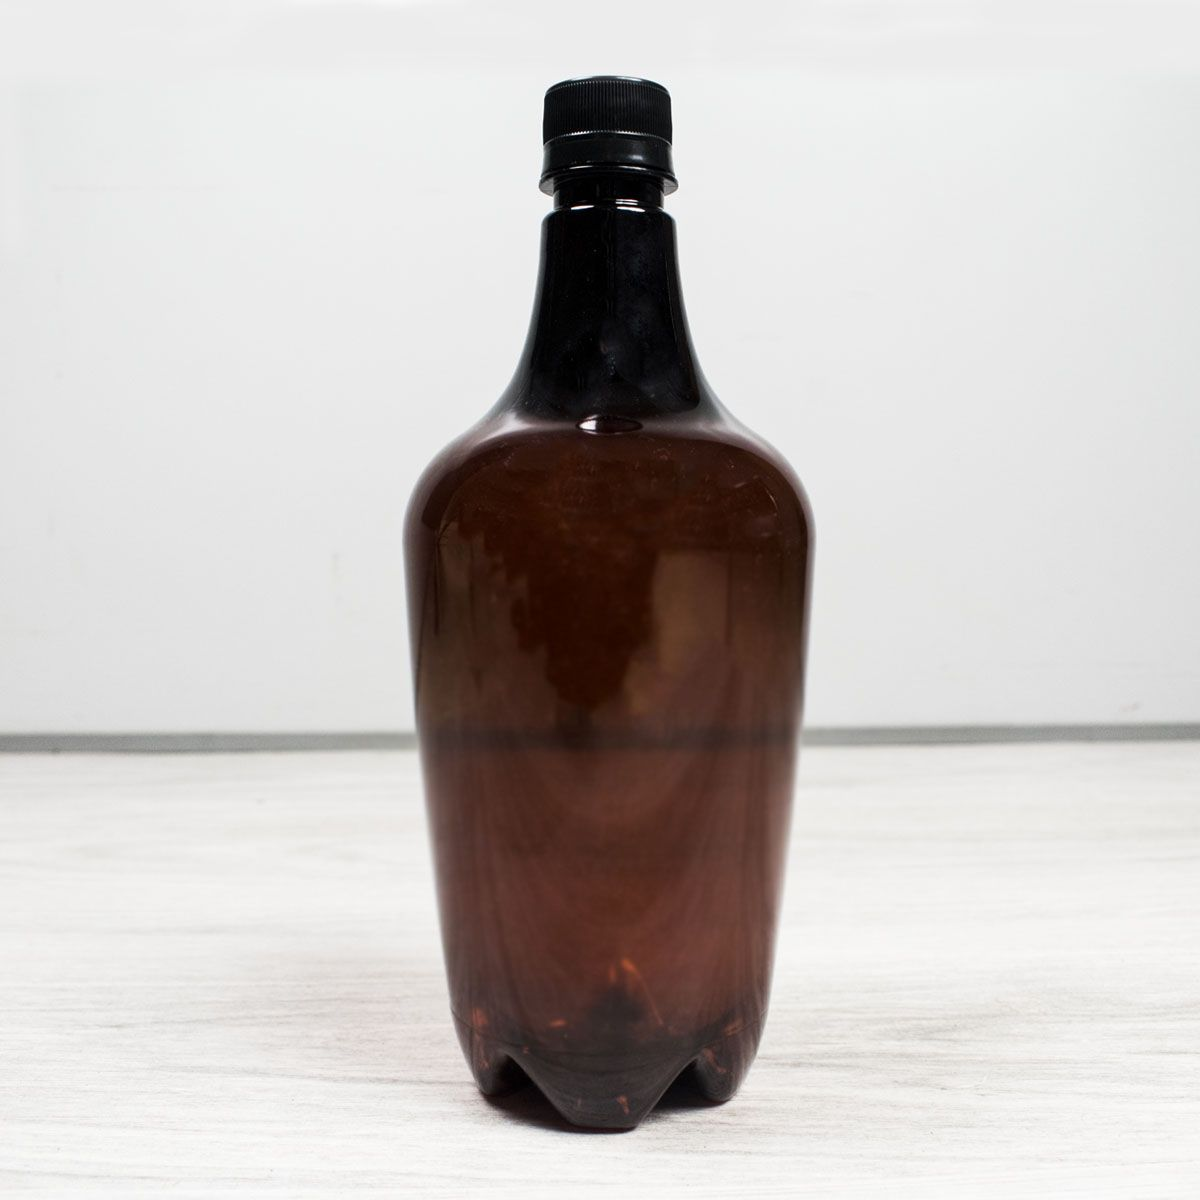 Growler Pet Ambar 1 Litro Para Cerveja Artesanal - Reutilizável